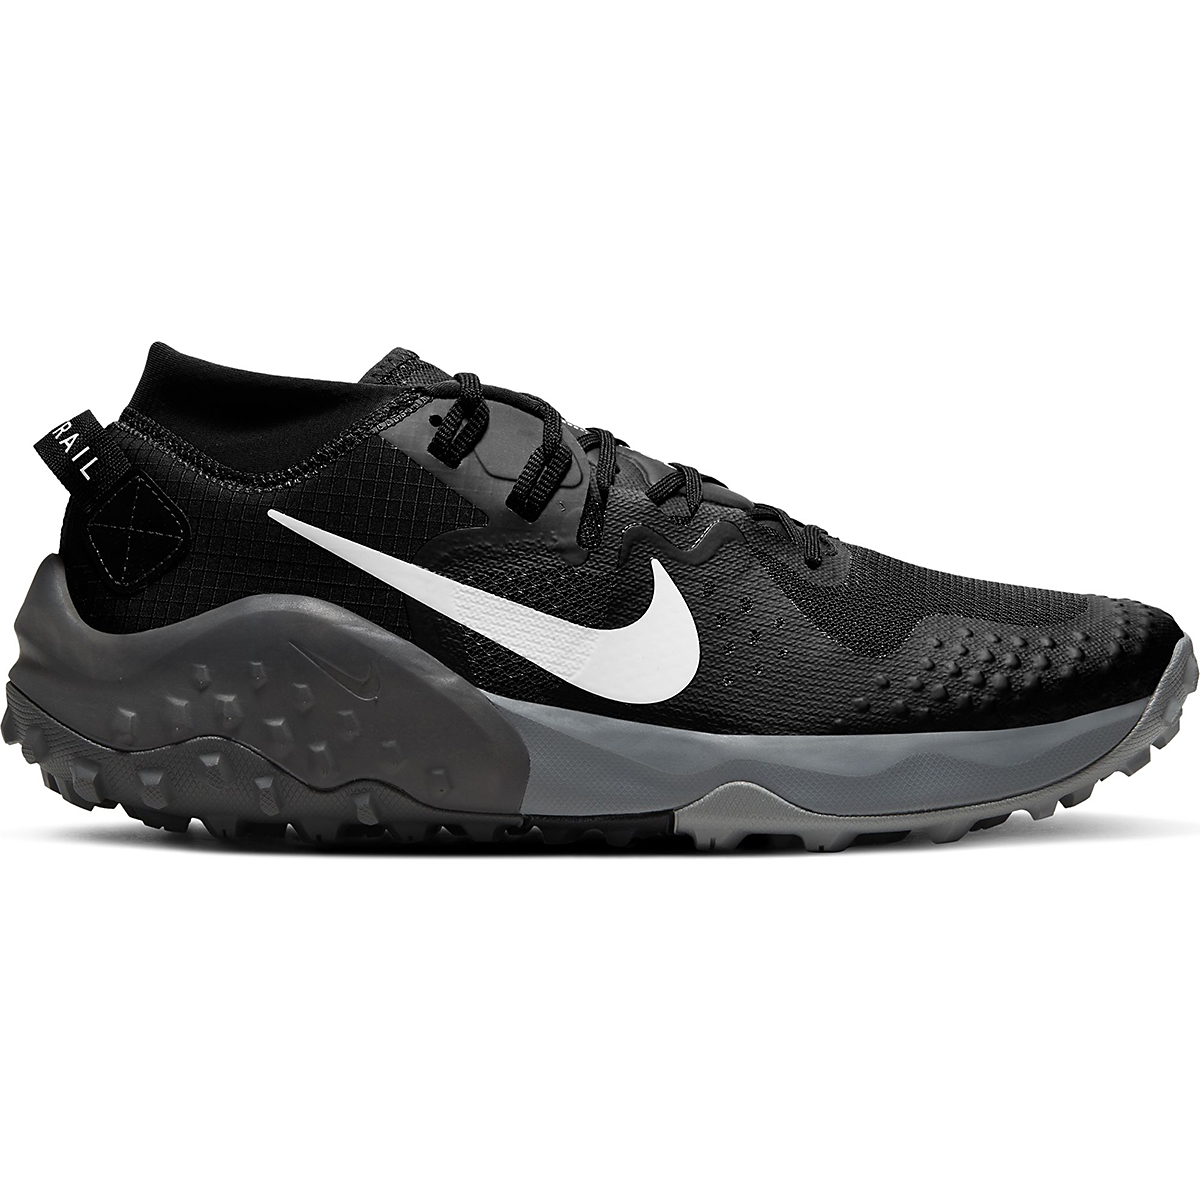 Men's Nike Wildhorse 6 Trail Running Shoe - Color: Off Noir/Spruce Aura-Black-Iron Grey - Size: 6 - Width: Regular, Off Noir/Spruce Aura-Black-Iron Grey, large, image 1